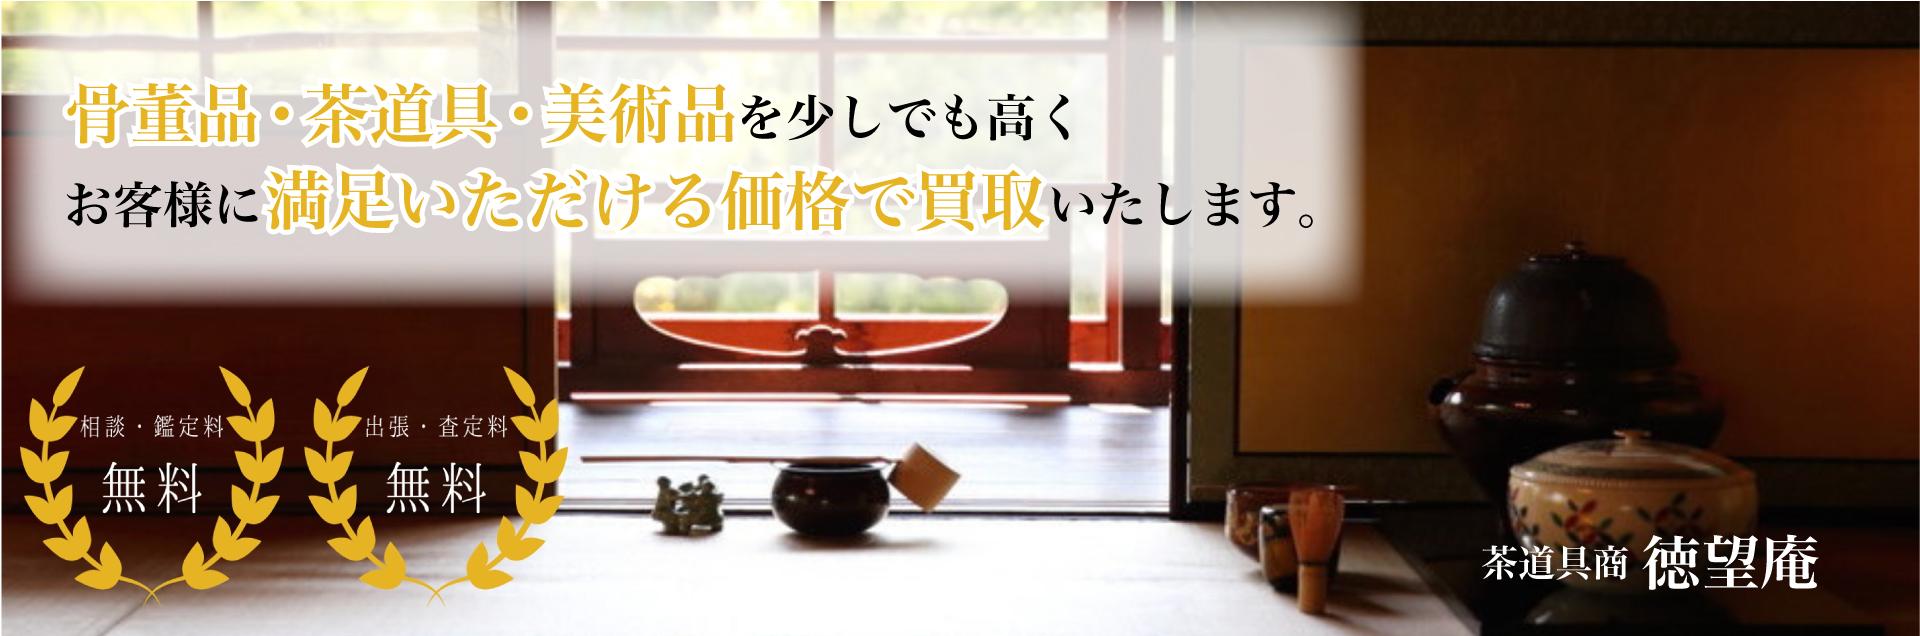 骨董・着物買取の徳望庵